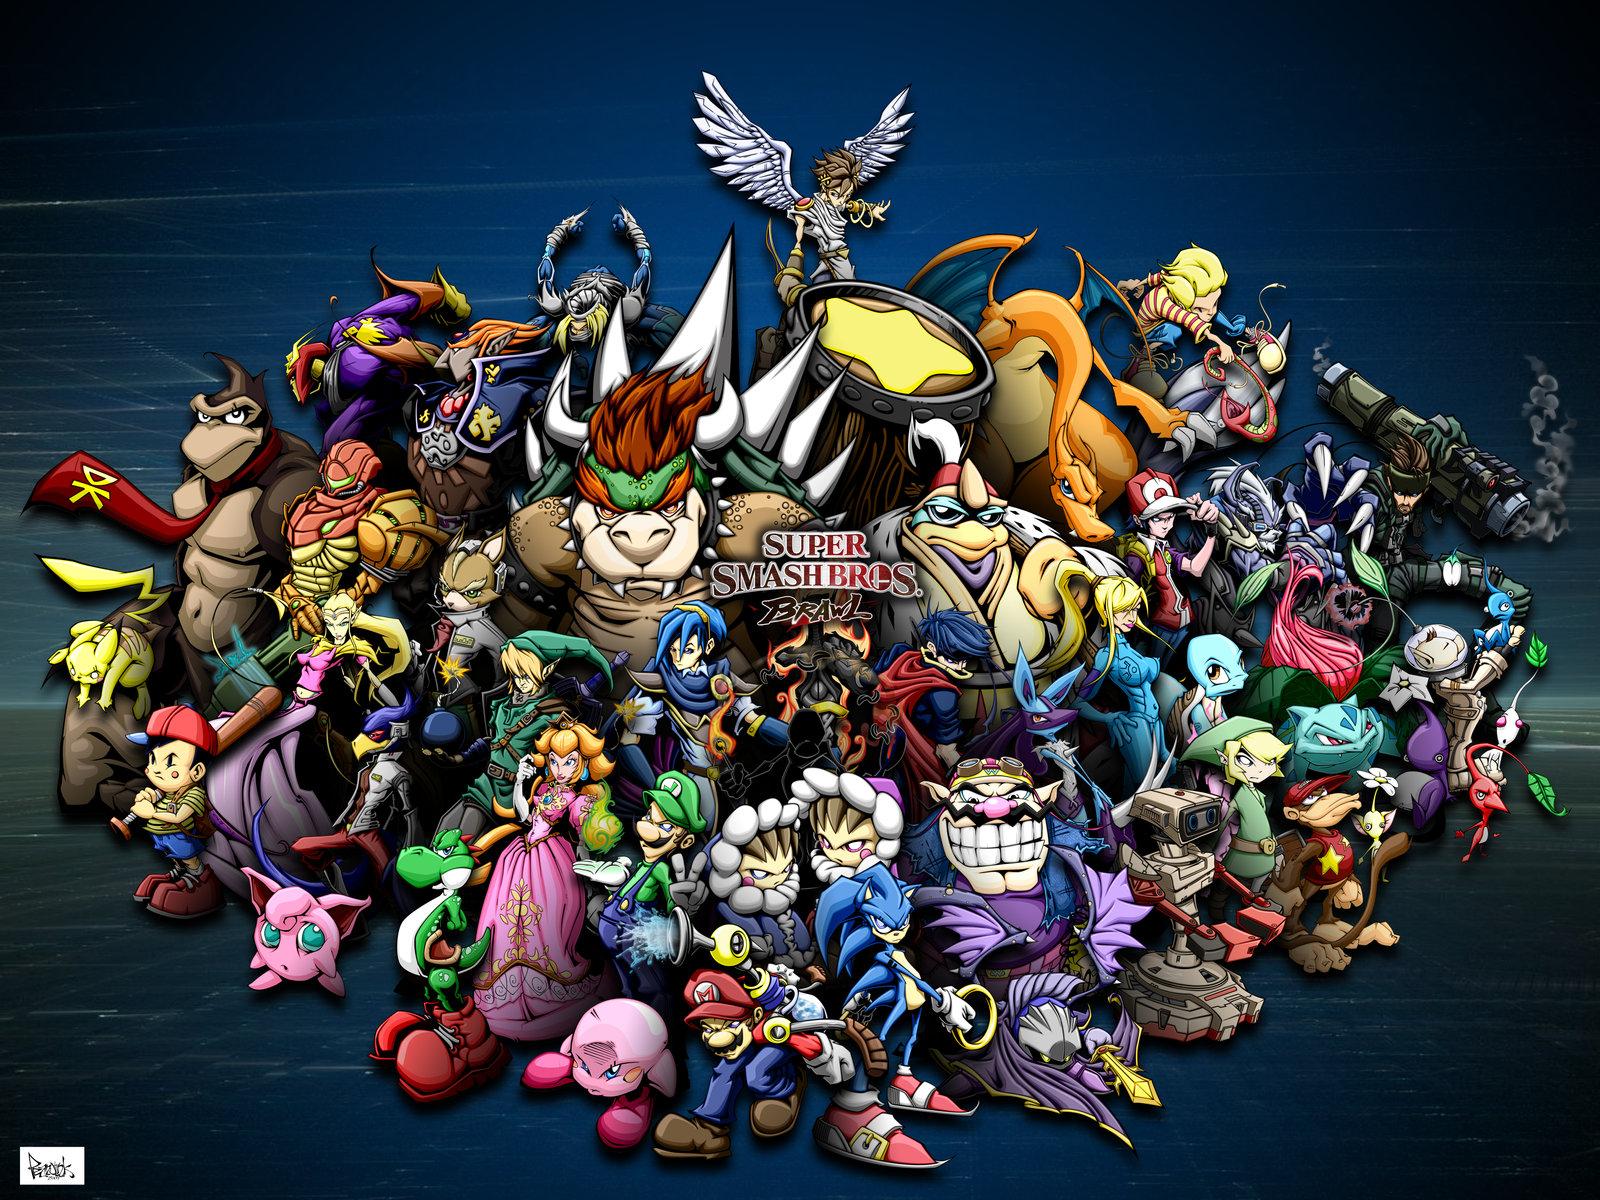 Super Smash Bros Brawl Wallpapers Video Game Hq Super Smash